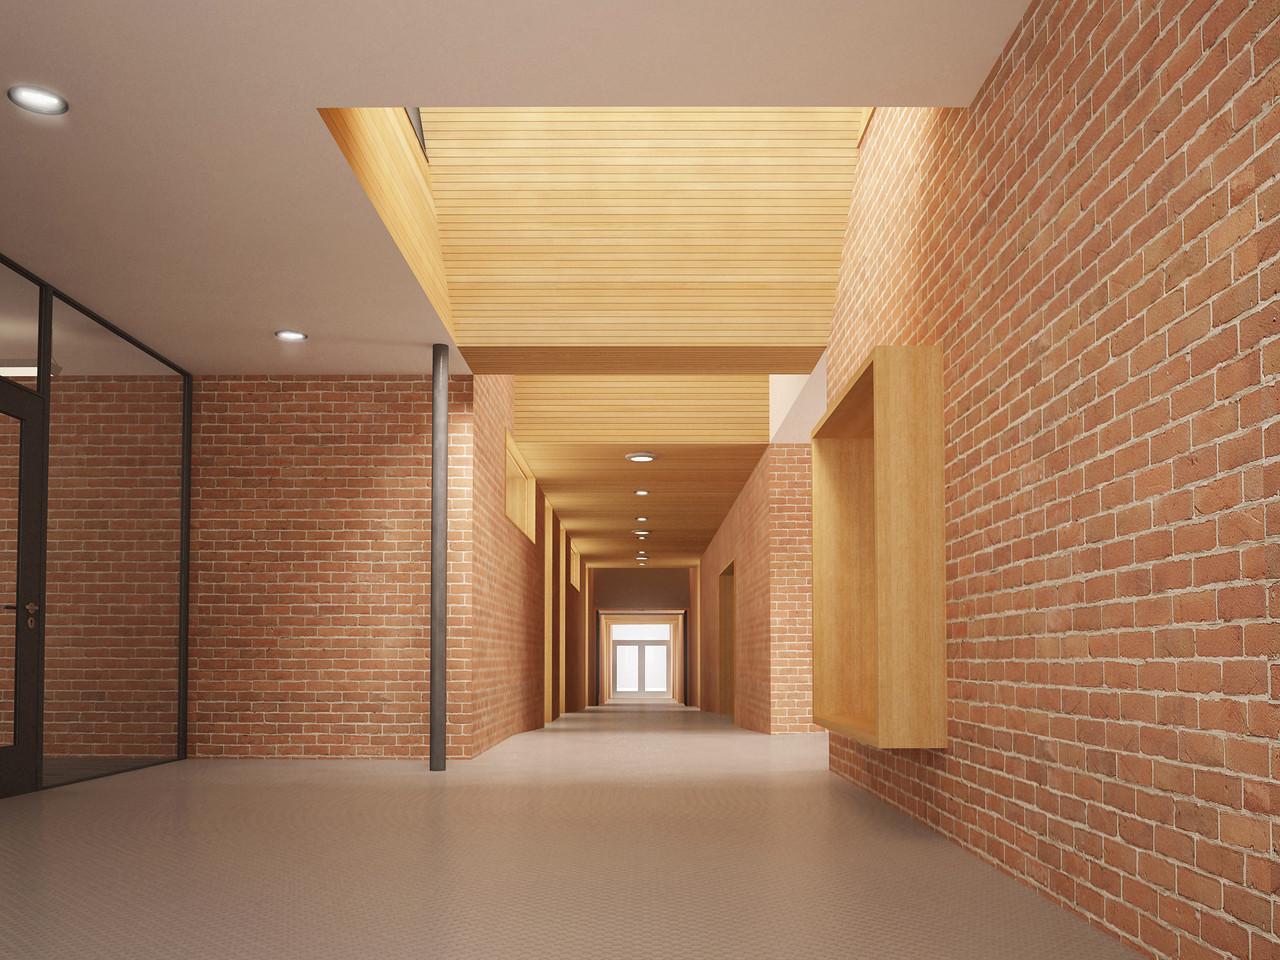 005 Corridor View.jpg